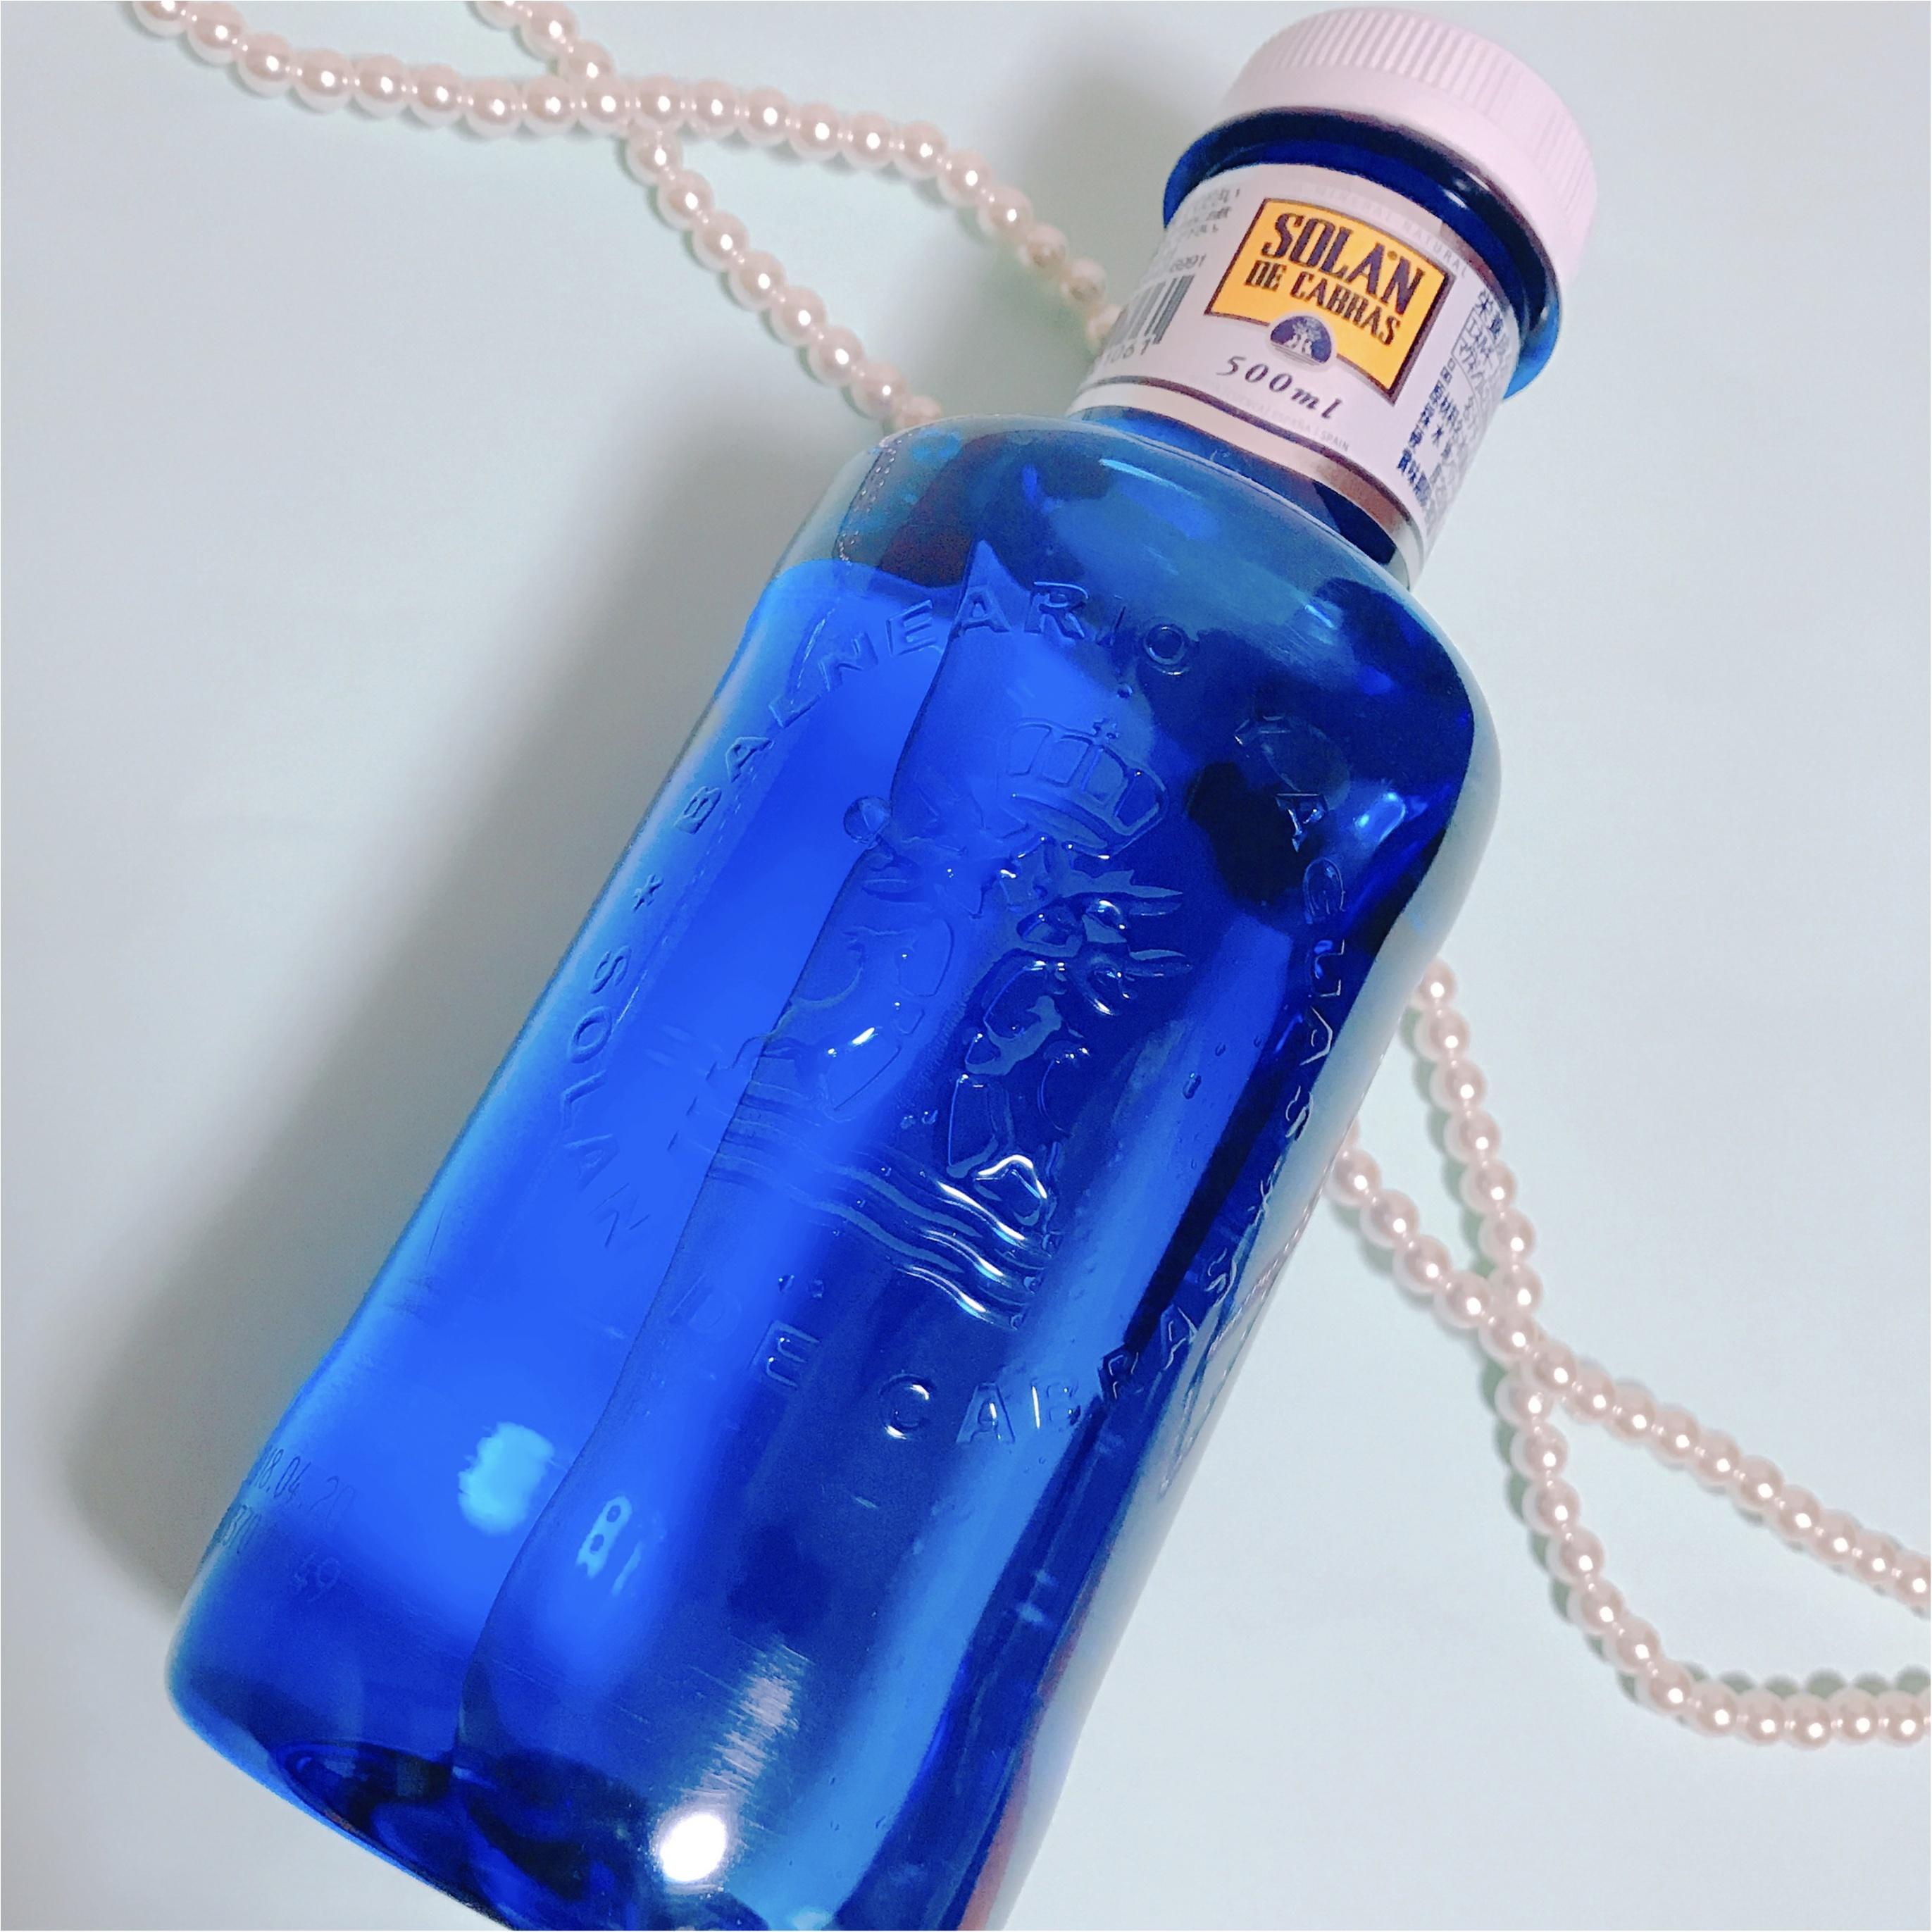 《SNSで話題沸騰中‼︎》噂の【ピンクの水】ソラン・デ・カブラスの限定ピンクボトルが可愛すぎる♡_1